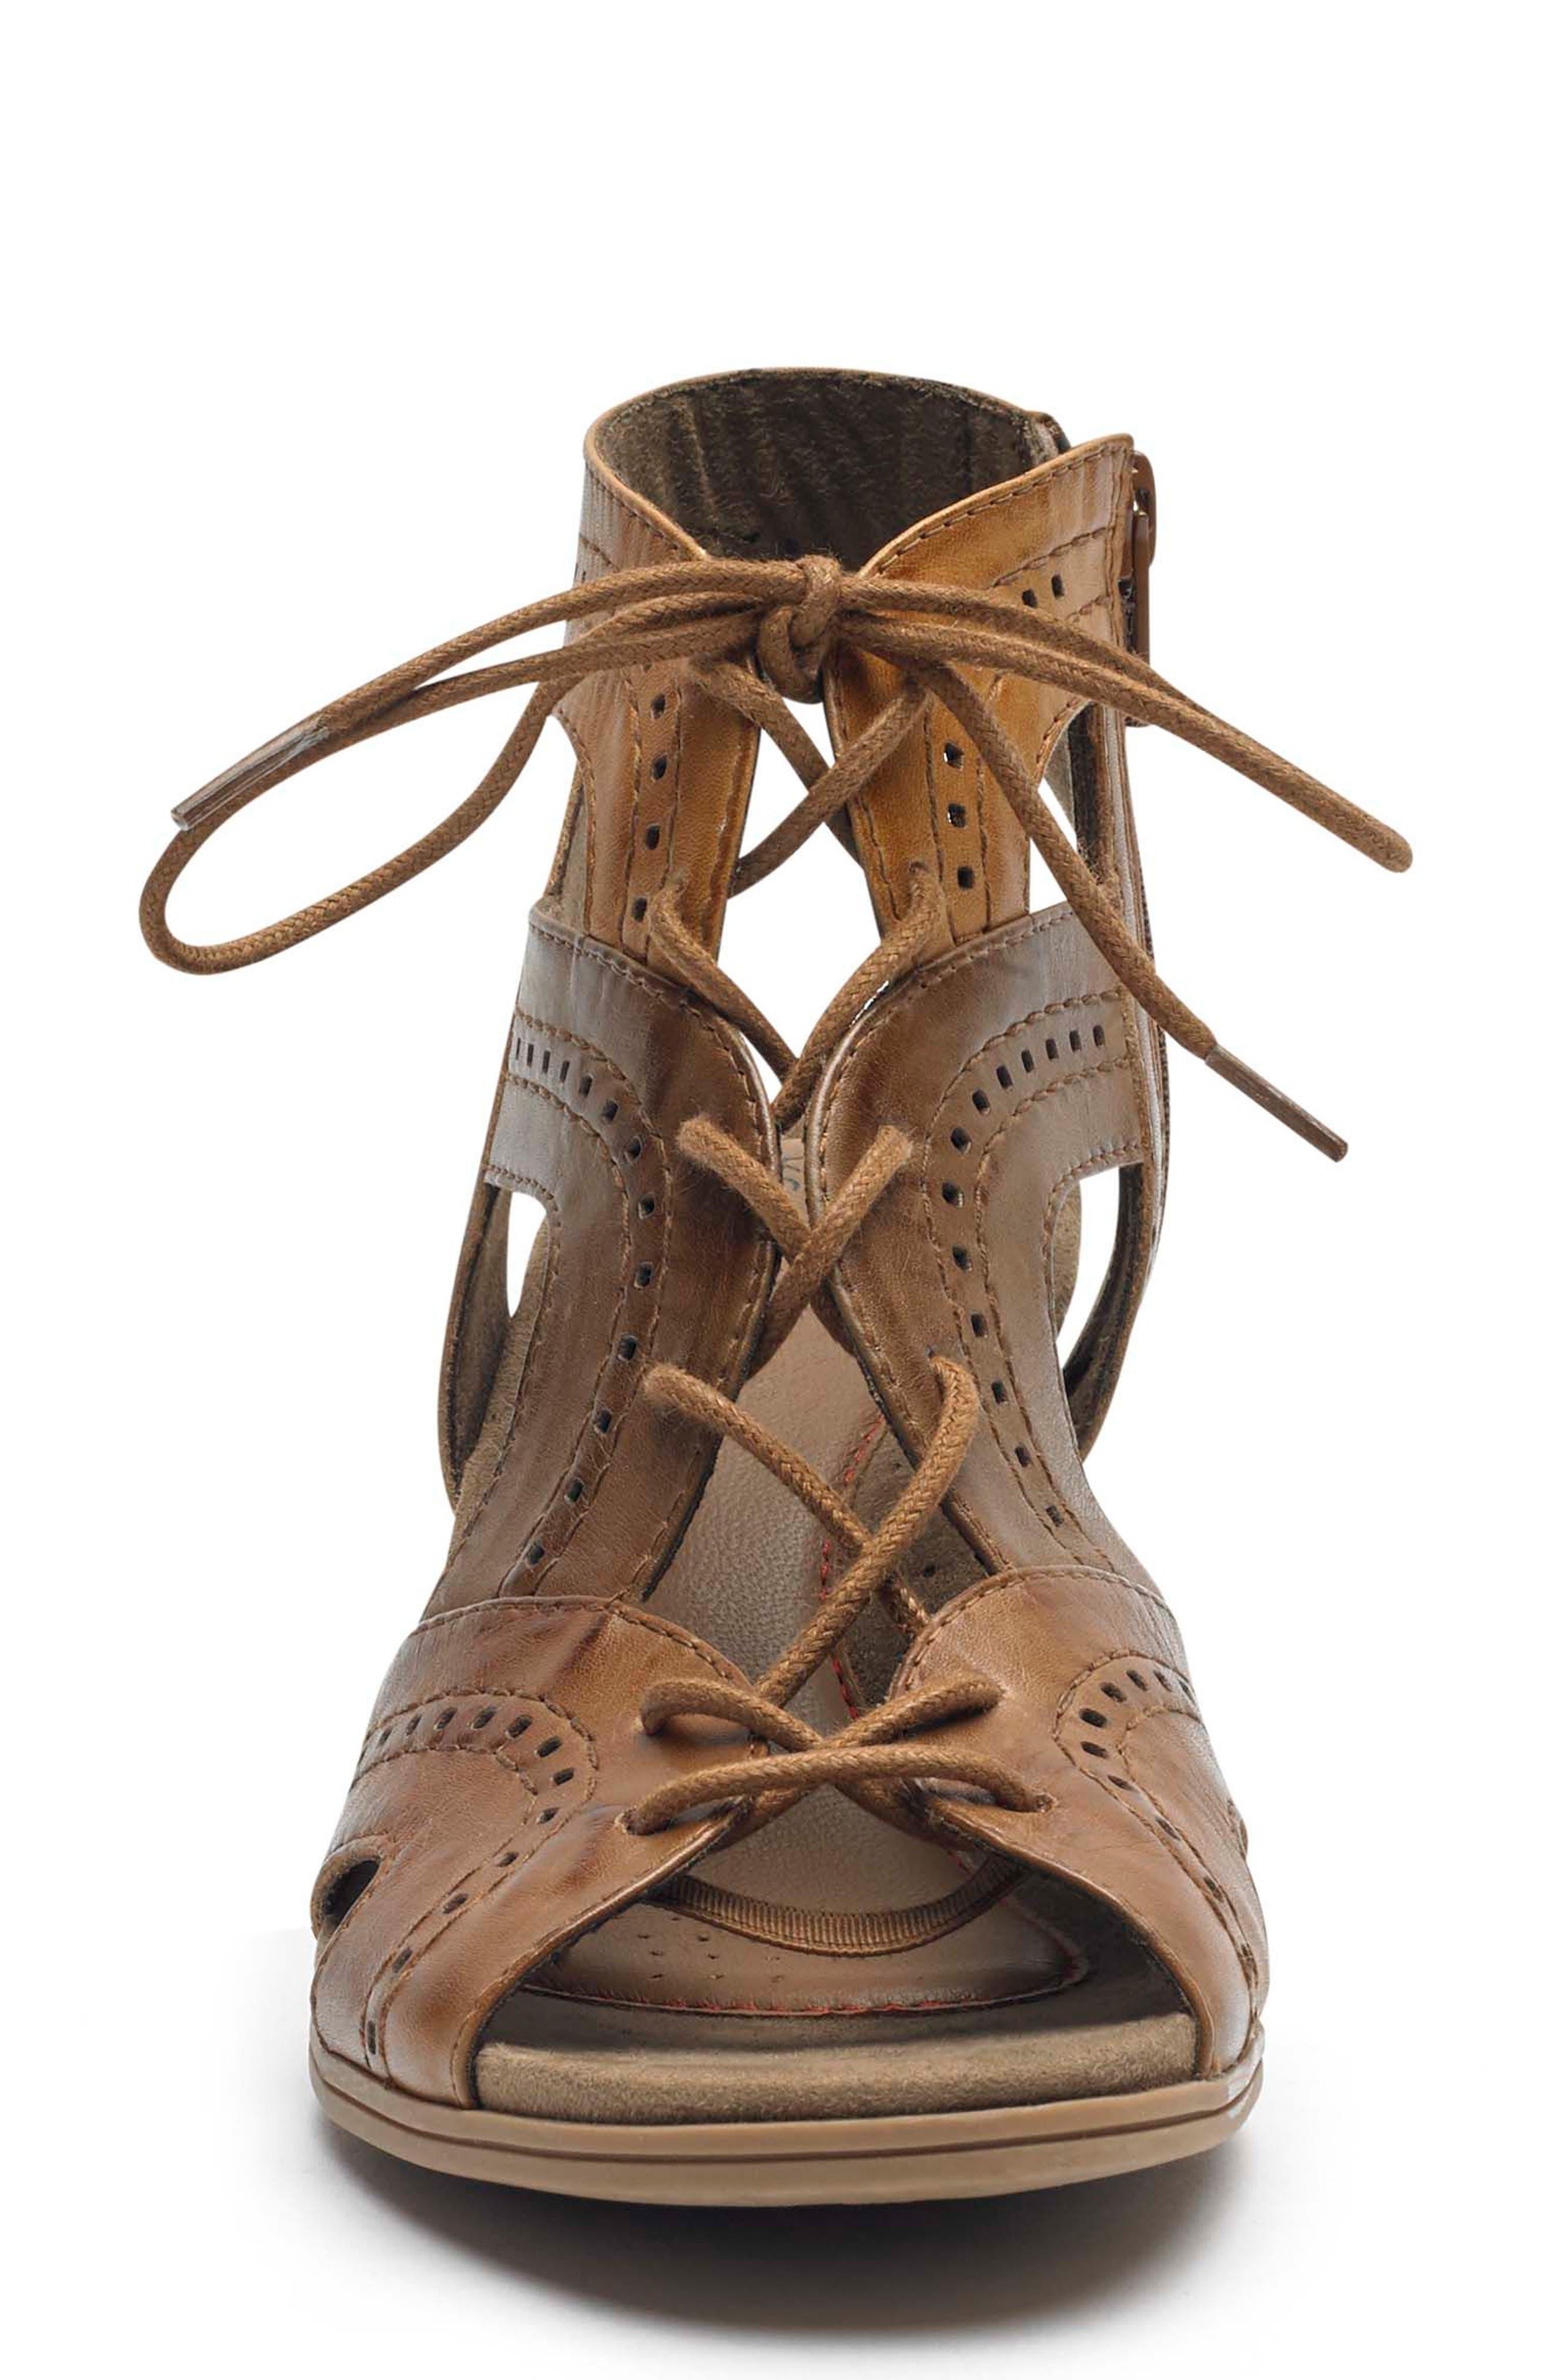 ROCKPORT COBB HILL,                             Hattie Lace-up Sandal,                             Alternate thumbnail 4, color,                             TAN LEATHER